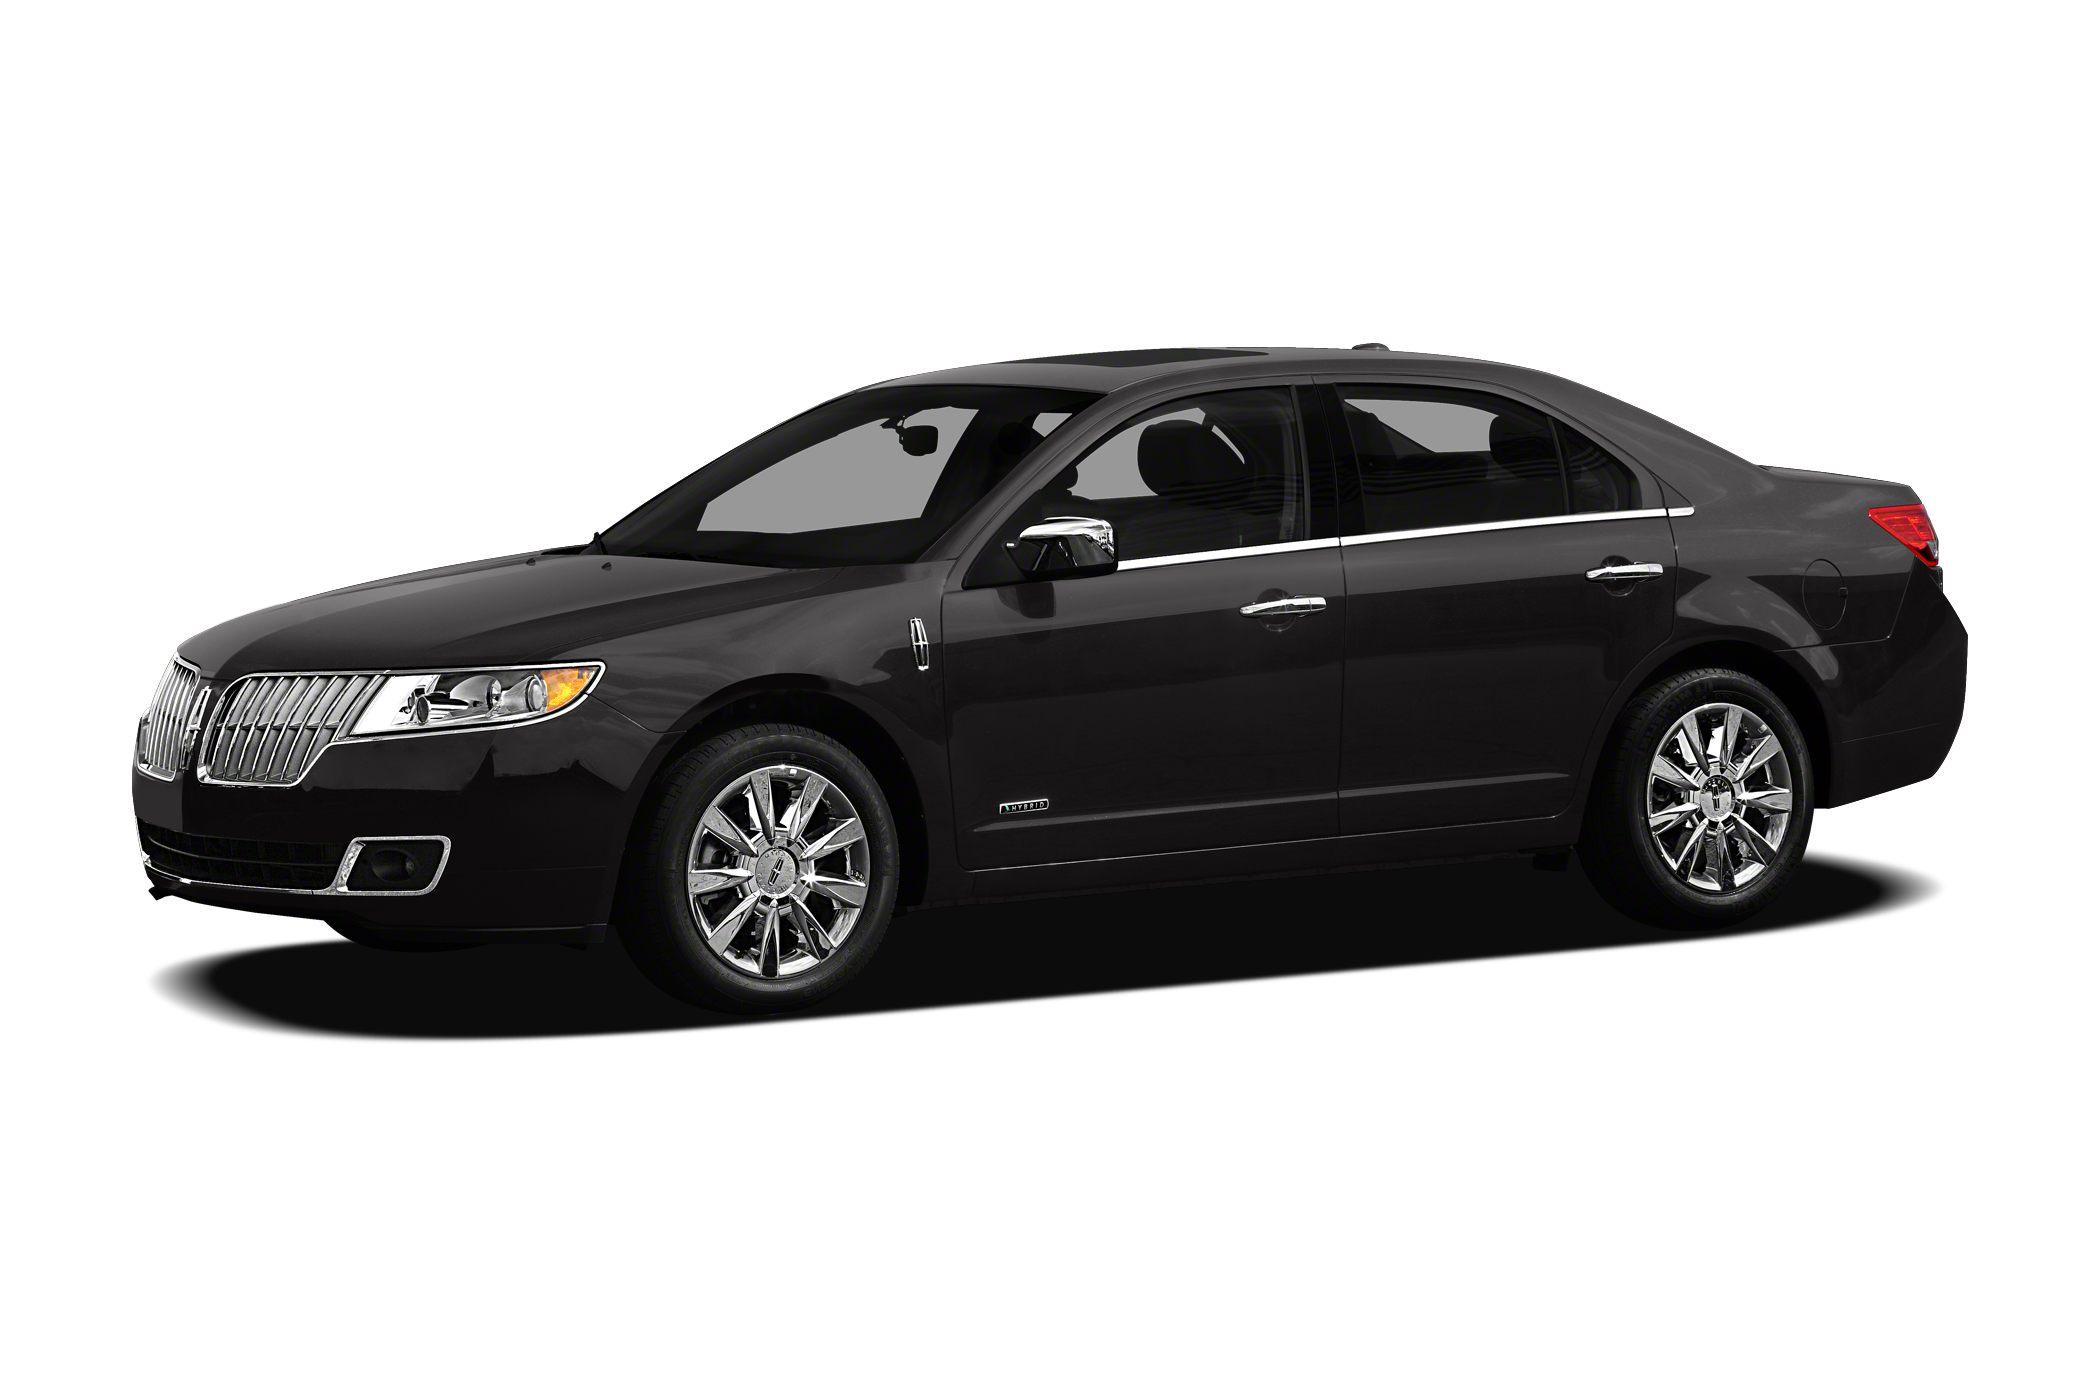 2012 Lincoln MKZ Hybrid Base Sedan for sale in Farmington for $22,995 with 36,105 miles.